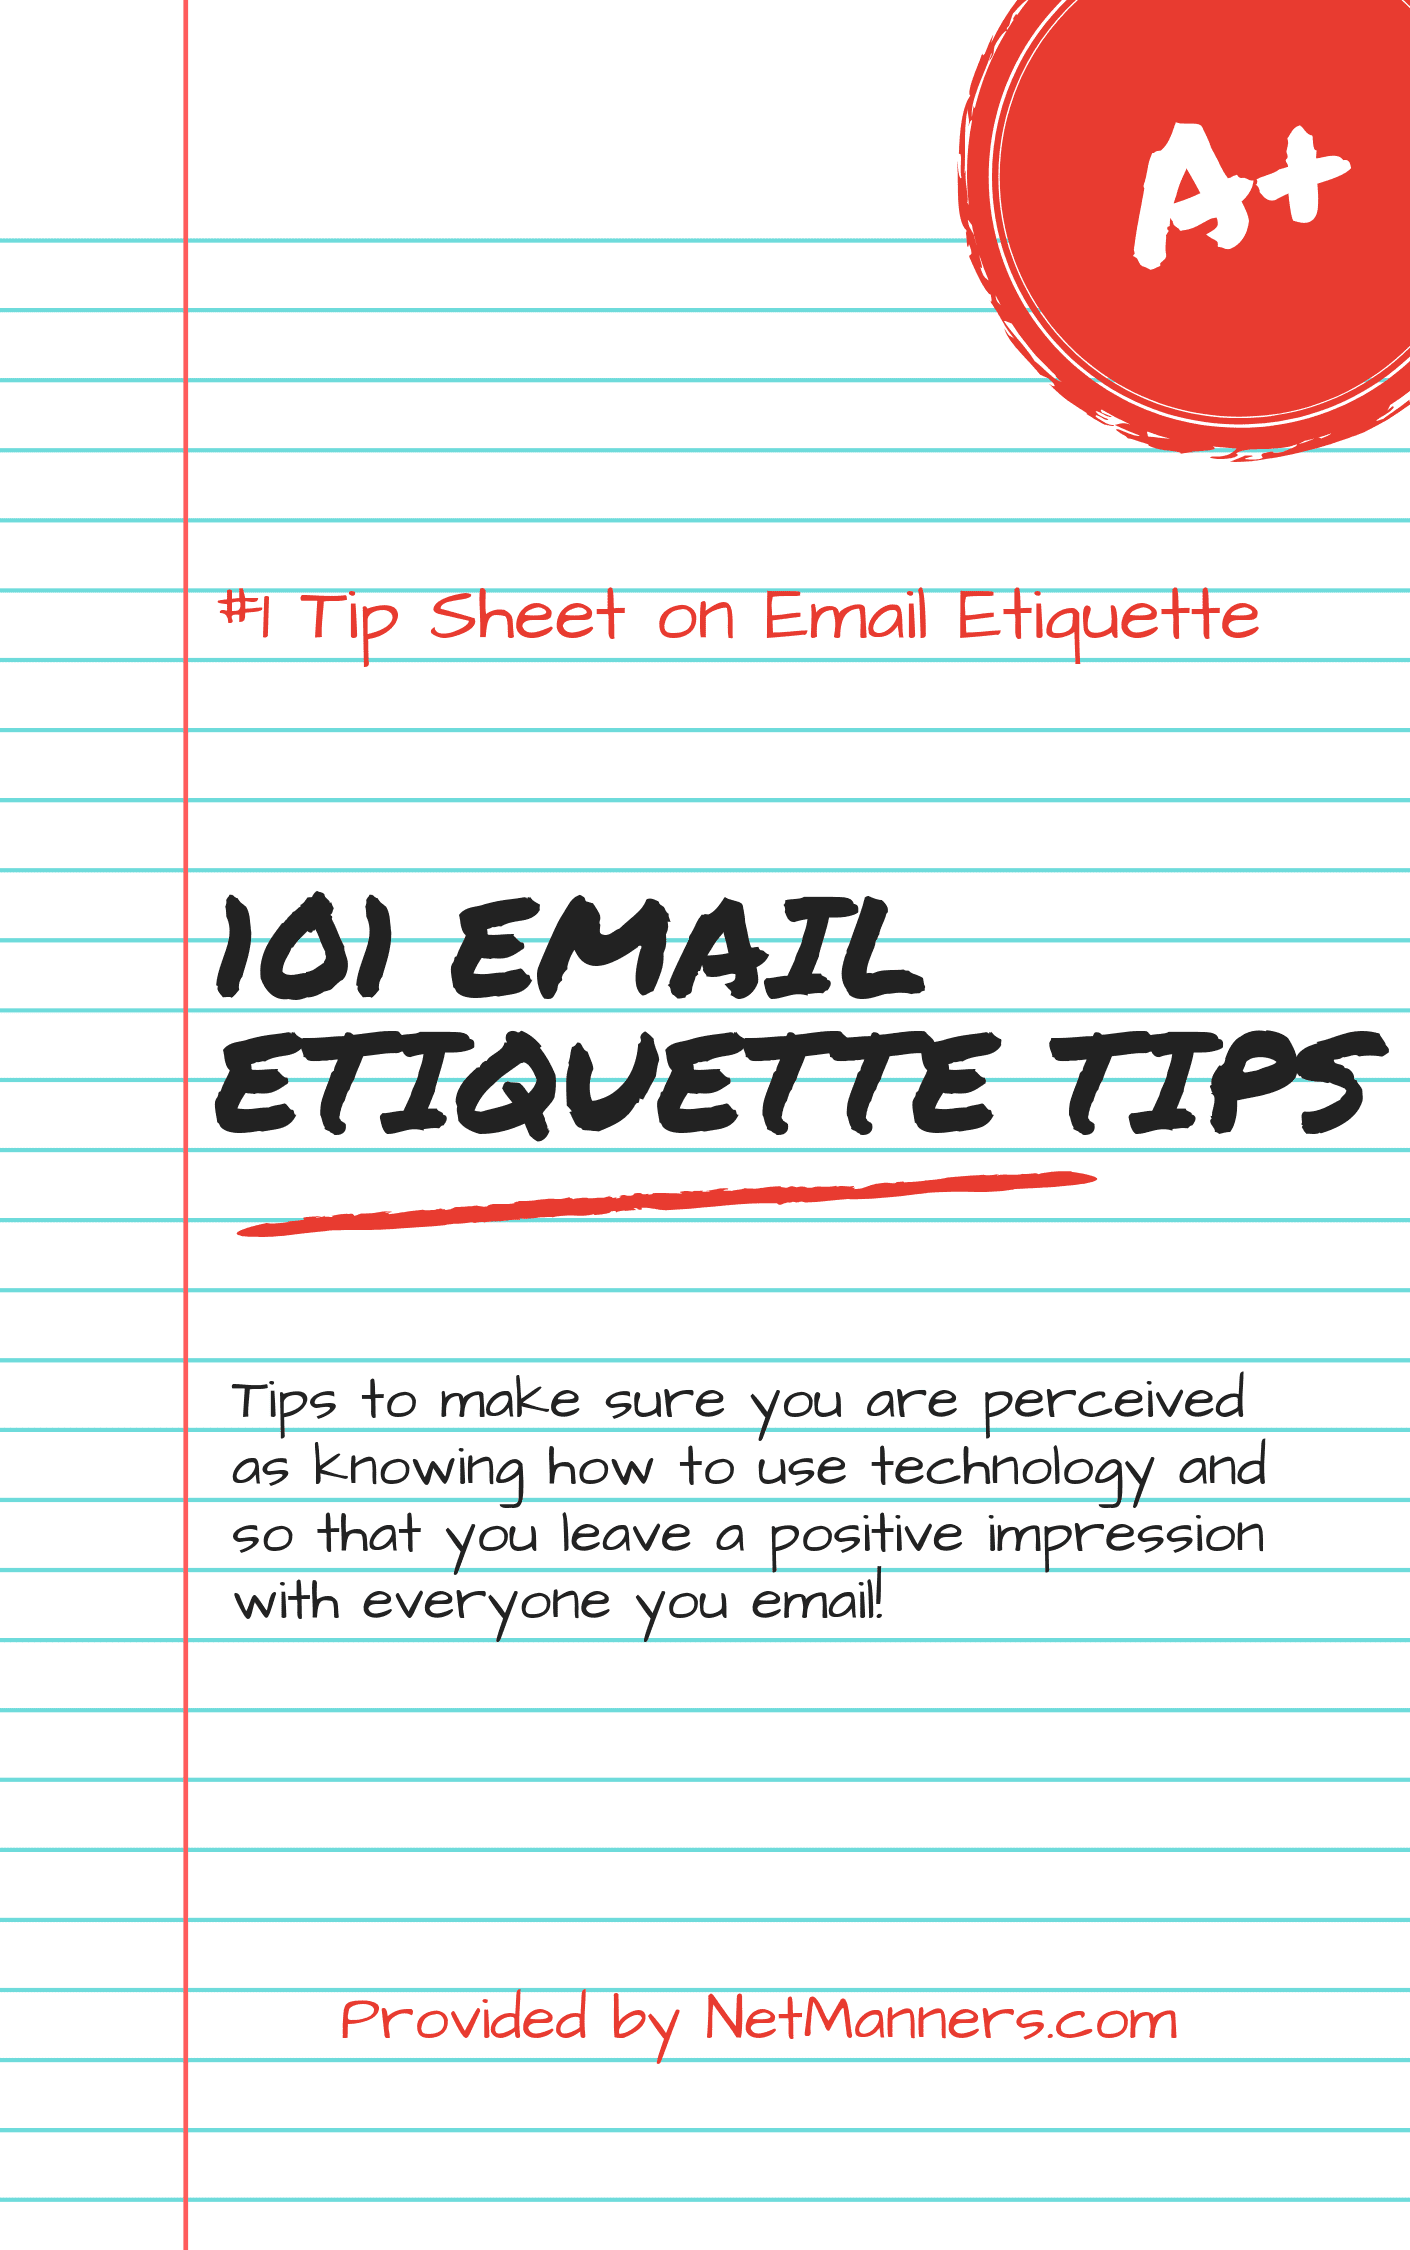 101 Email Etiquette Tips in 2020 Etiquette, Teaching